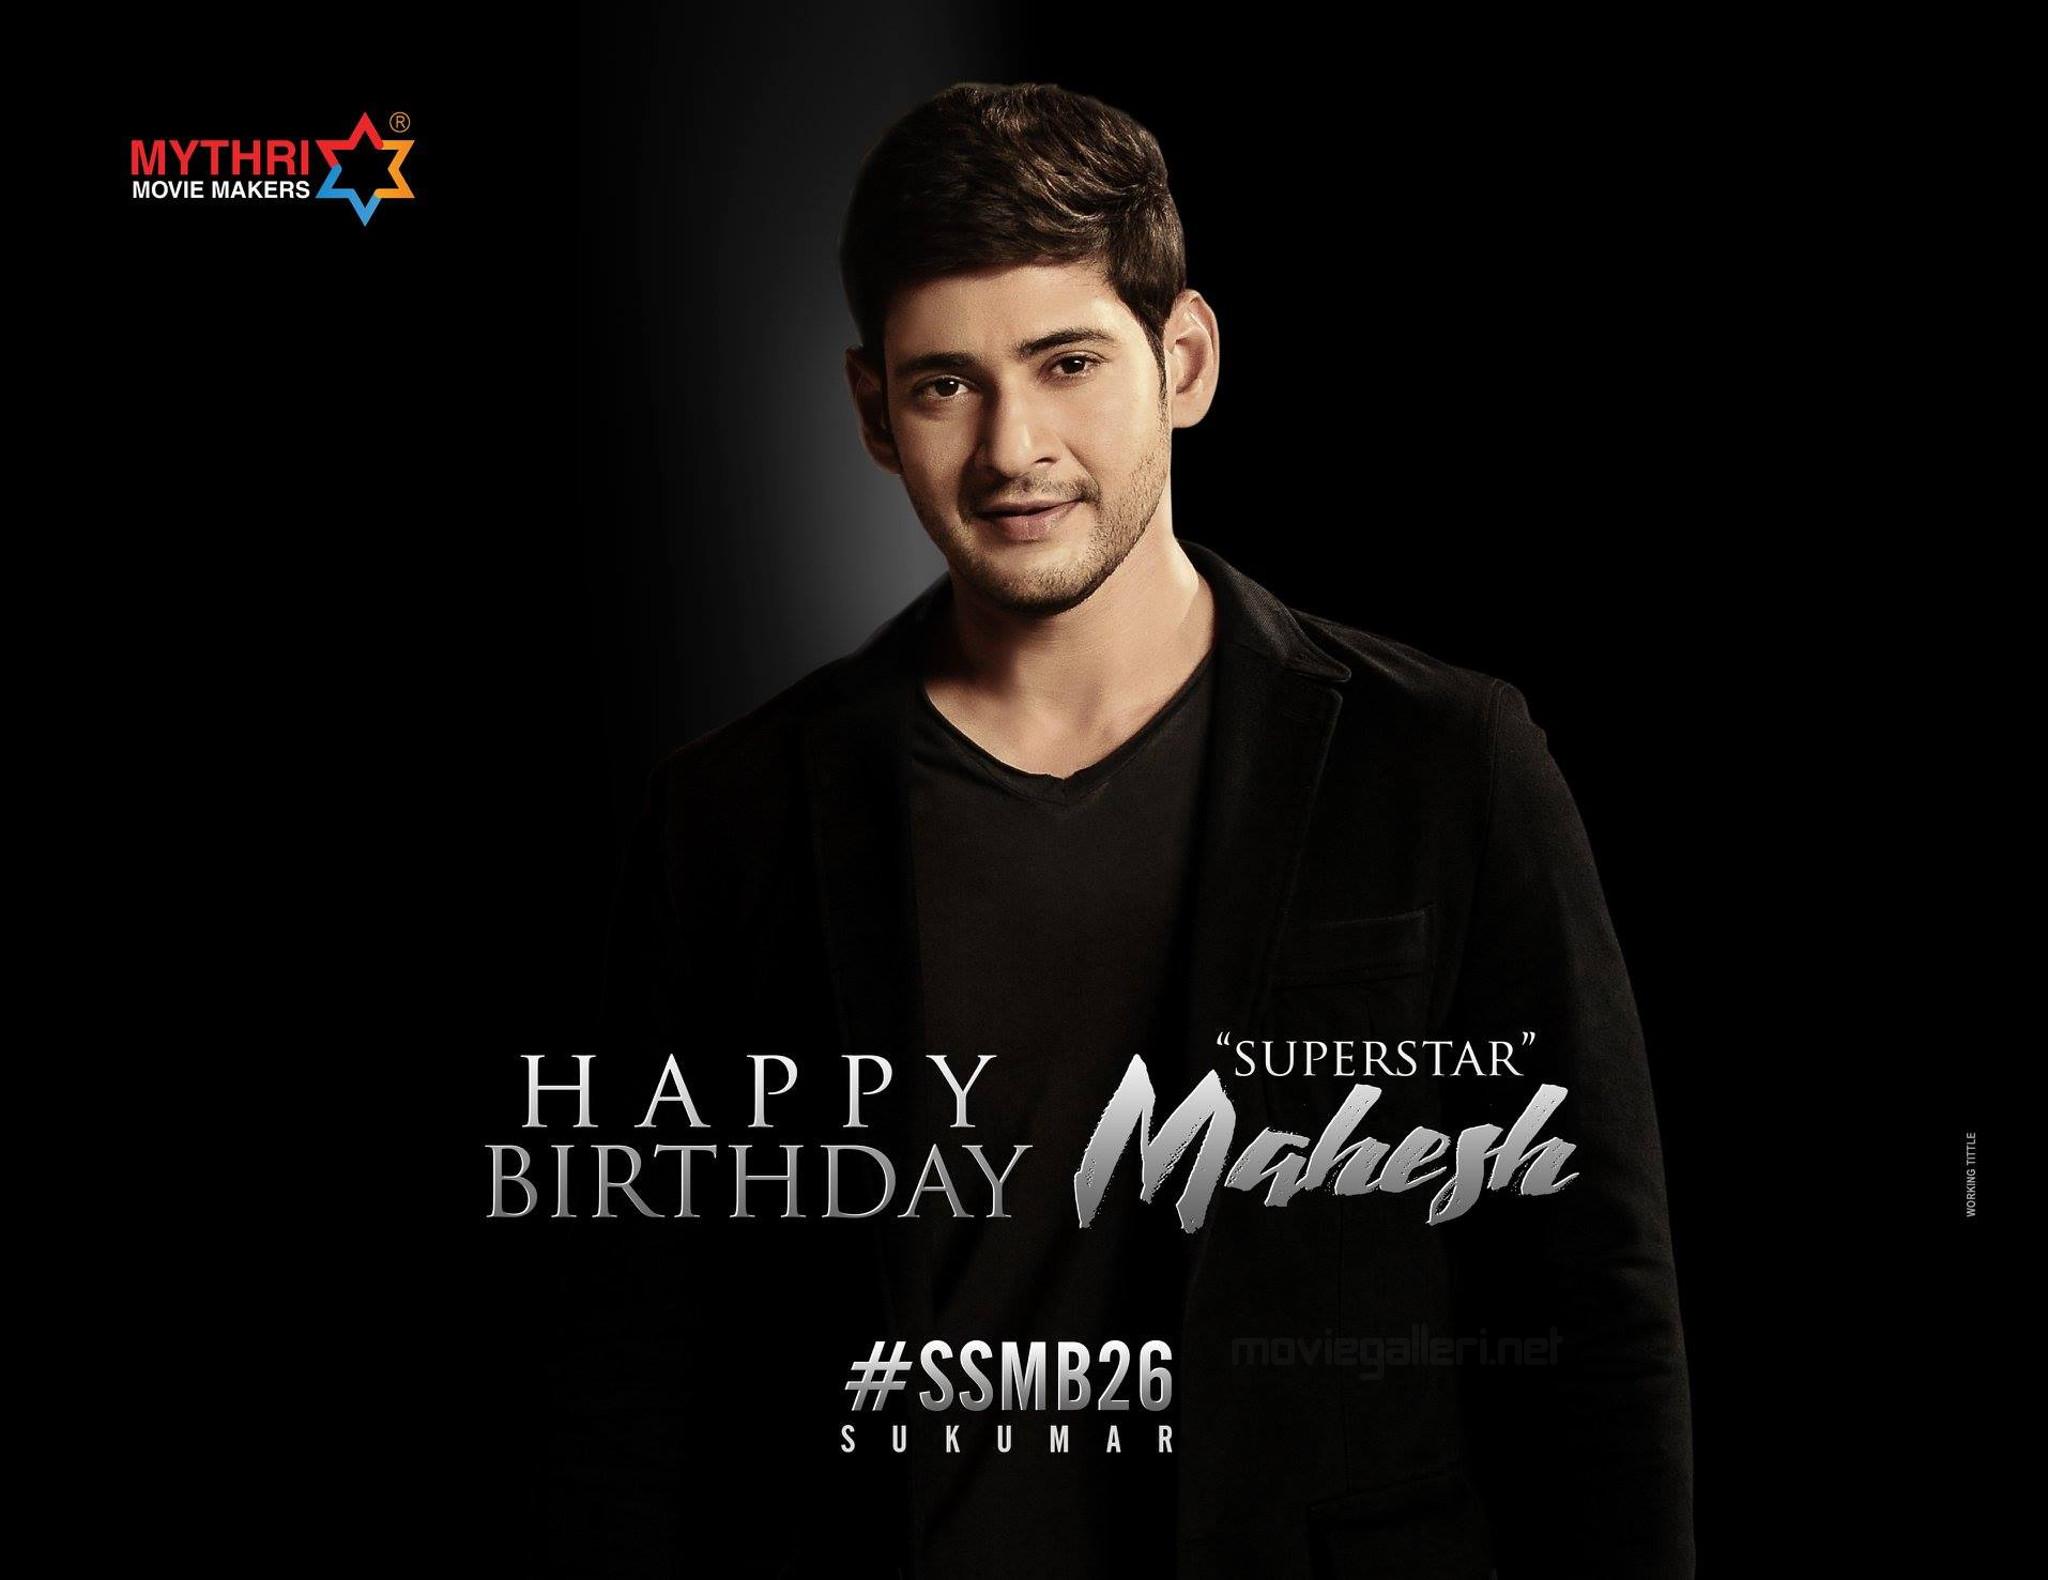 Mythri Movie Makers Sukumar SSMB26 Team wishes Mahesh Babu Birthday Poster HD